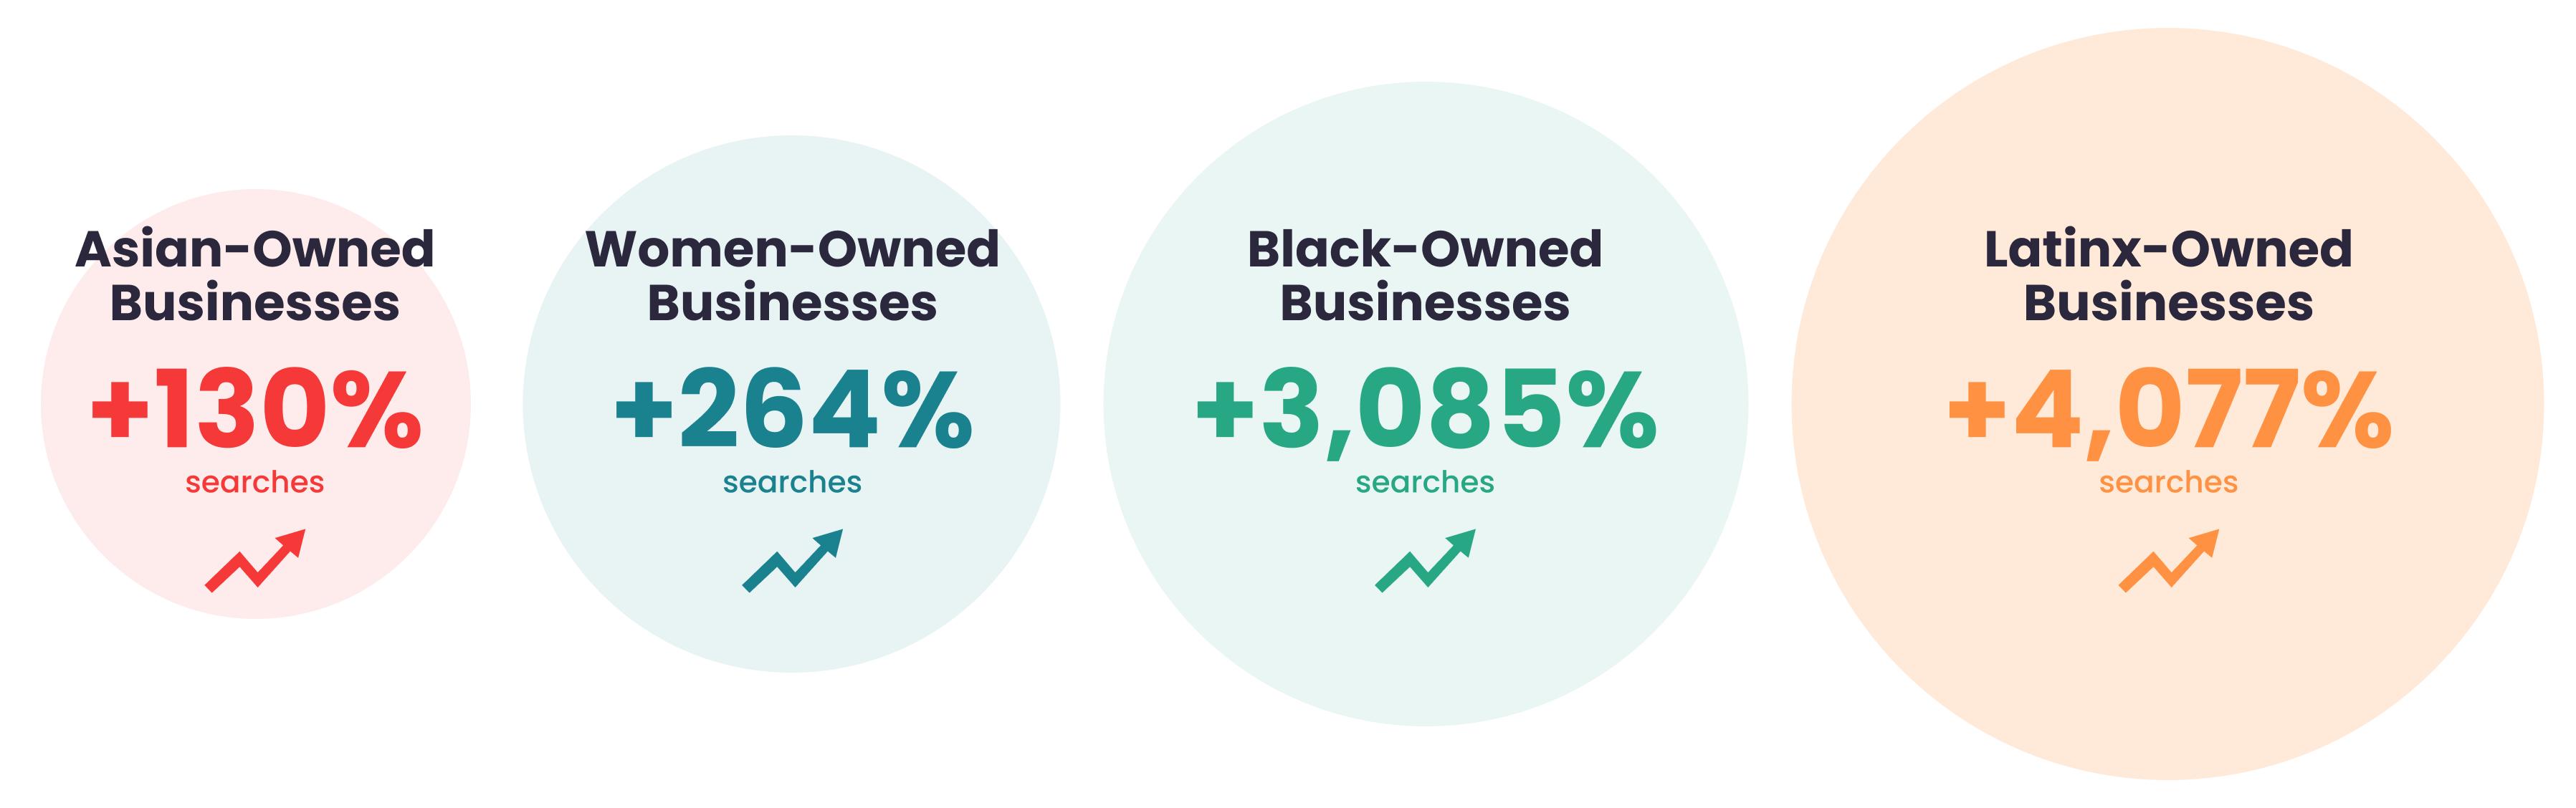 Yelp رشد عمده جستجو در مشاغل متنوع را گزارش می دهد